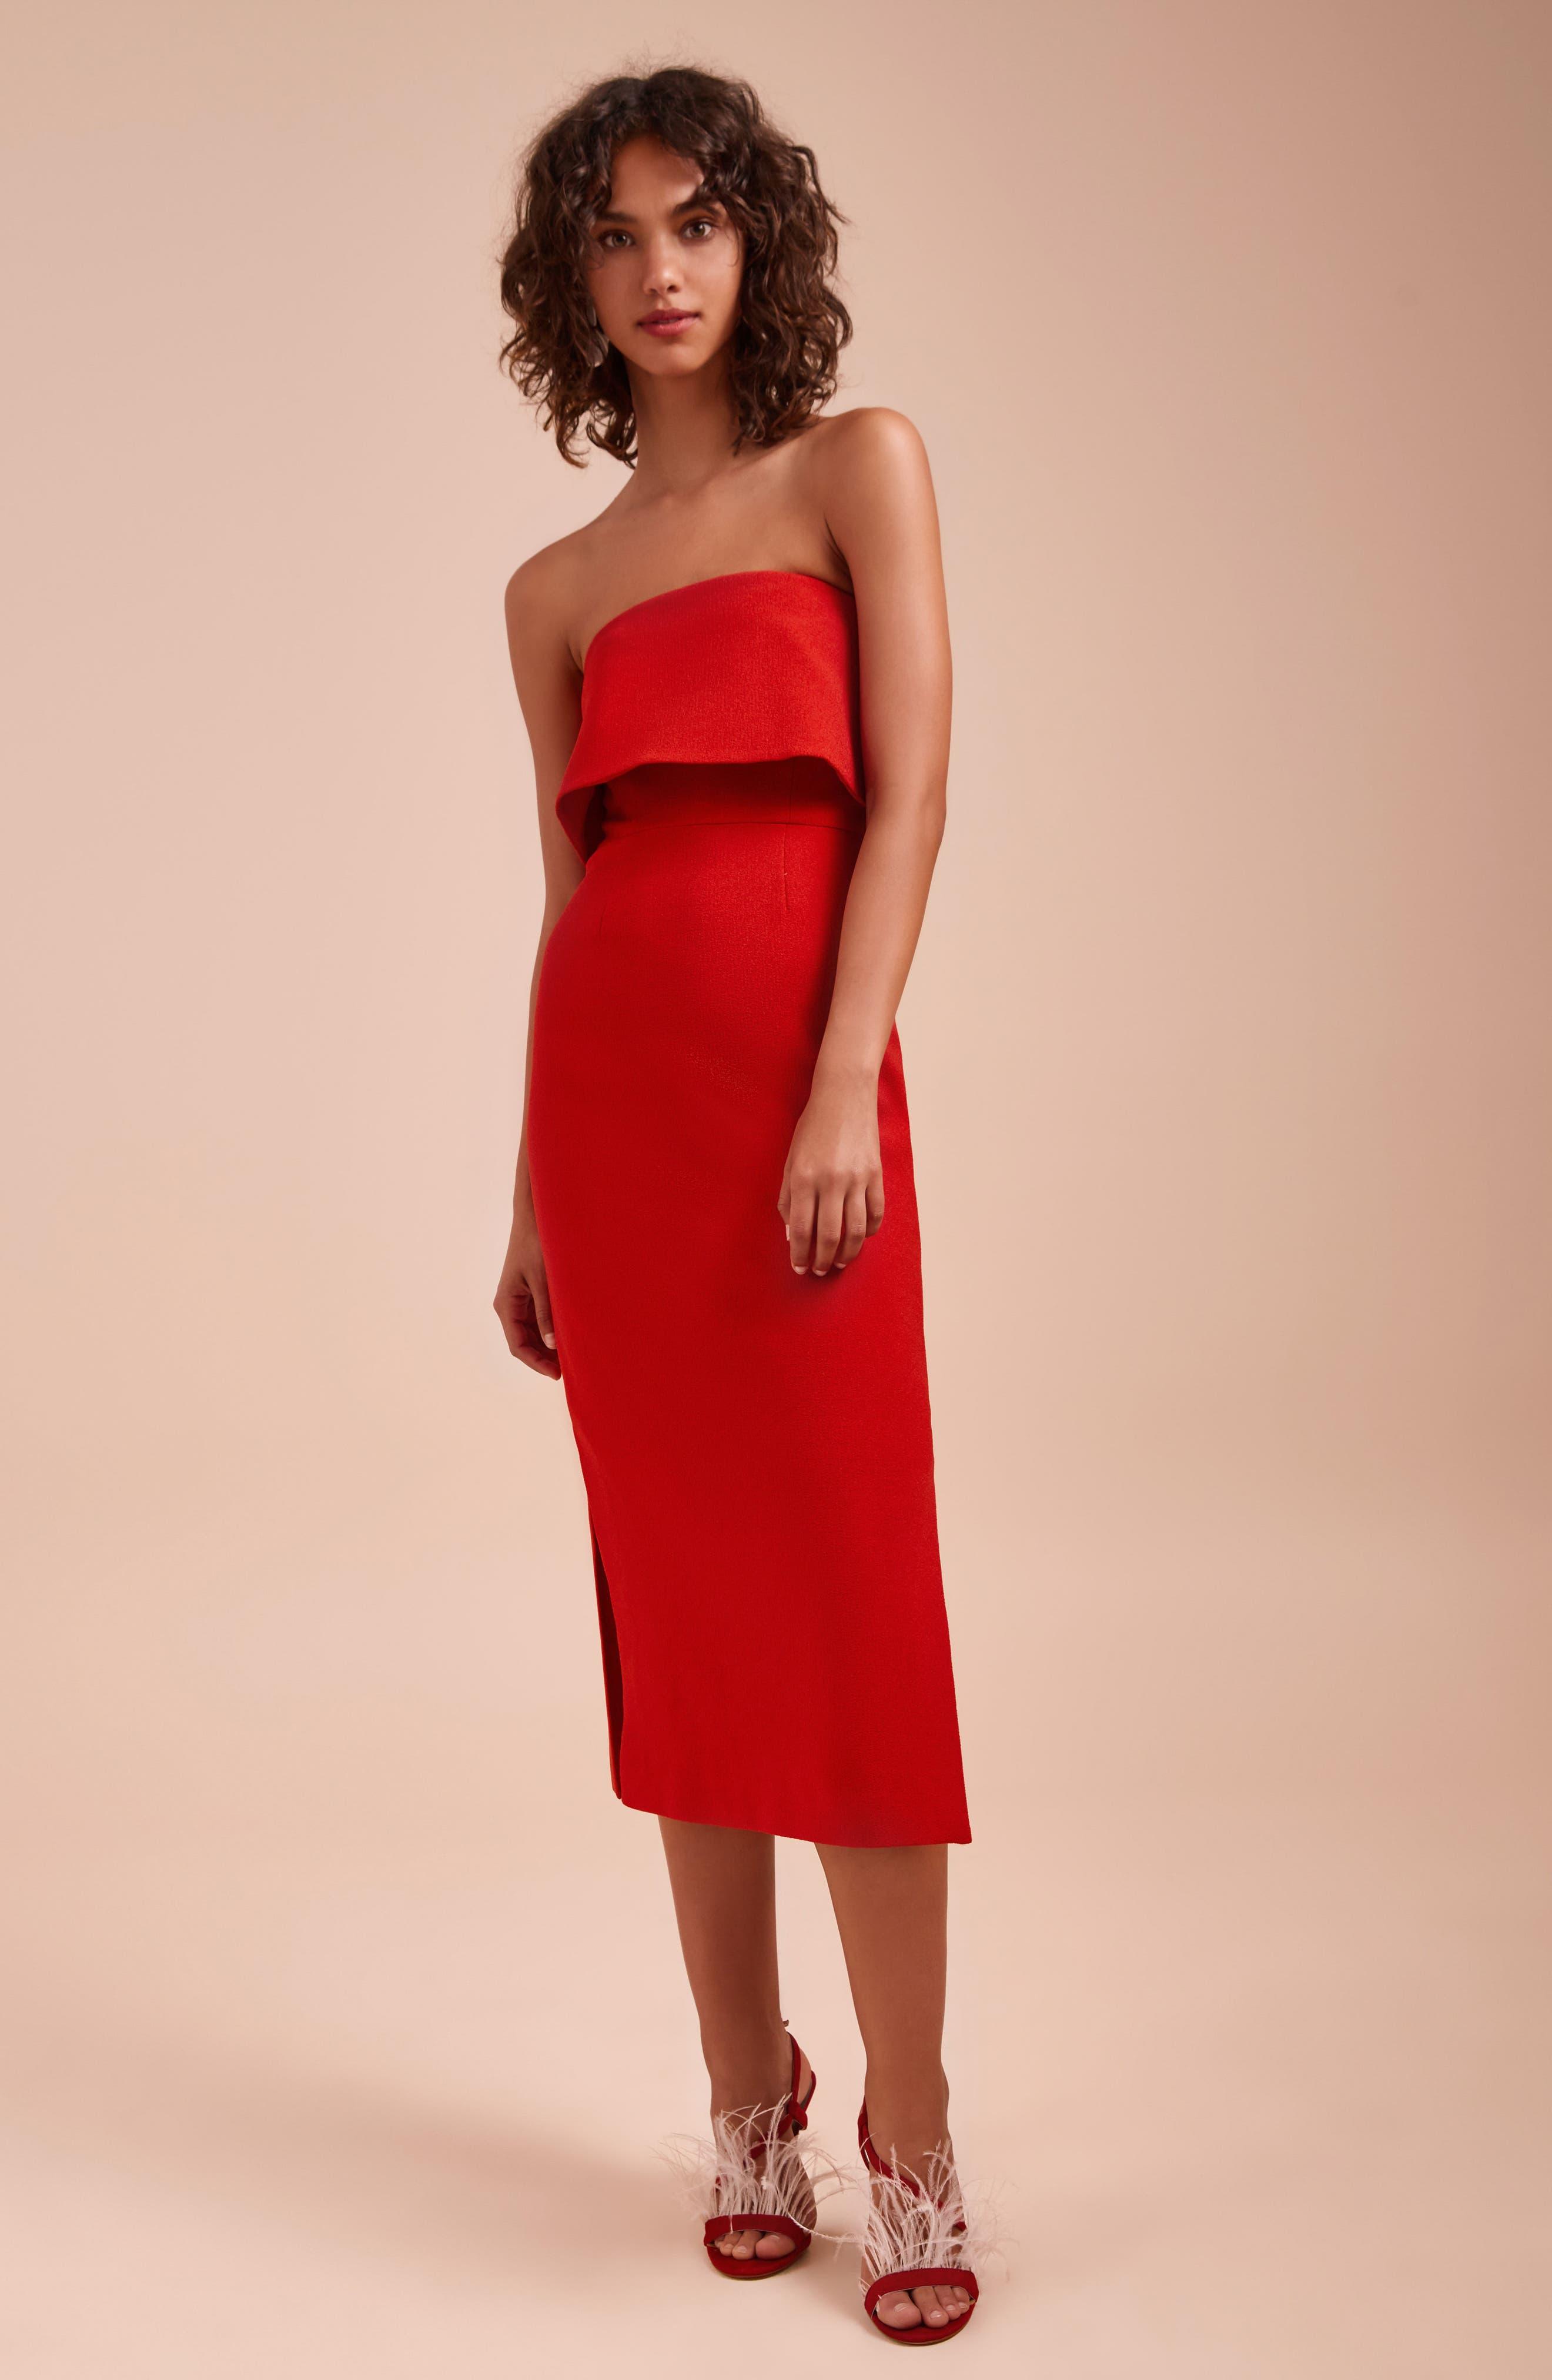 Entice Strapless Midi Dress,                             Alternate thumbnail 7, color,                             Red